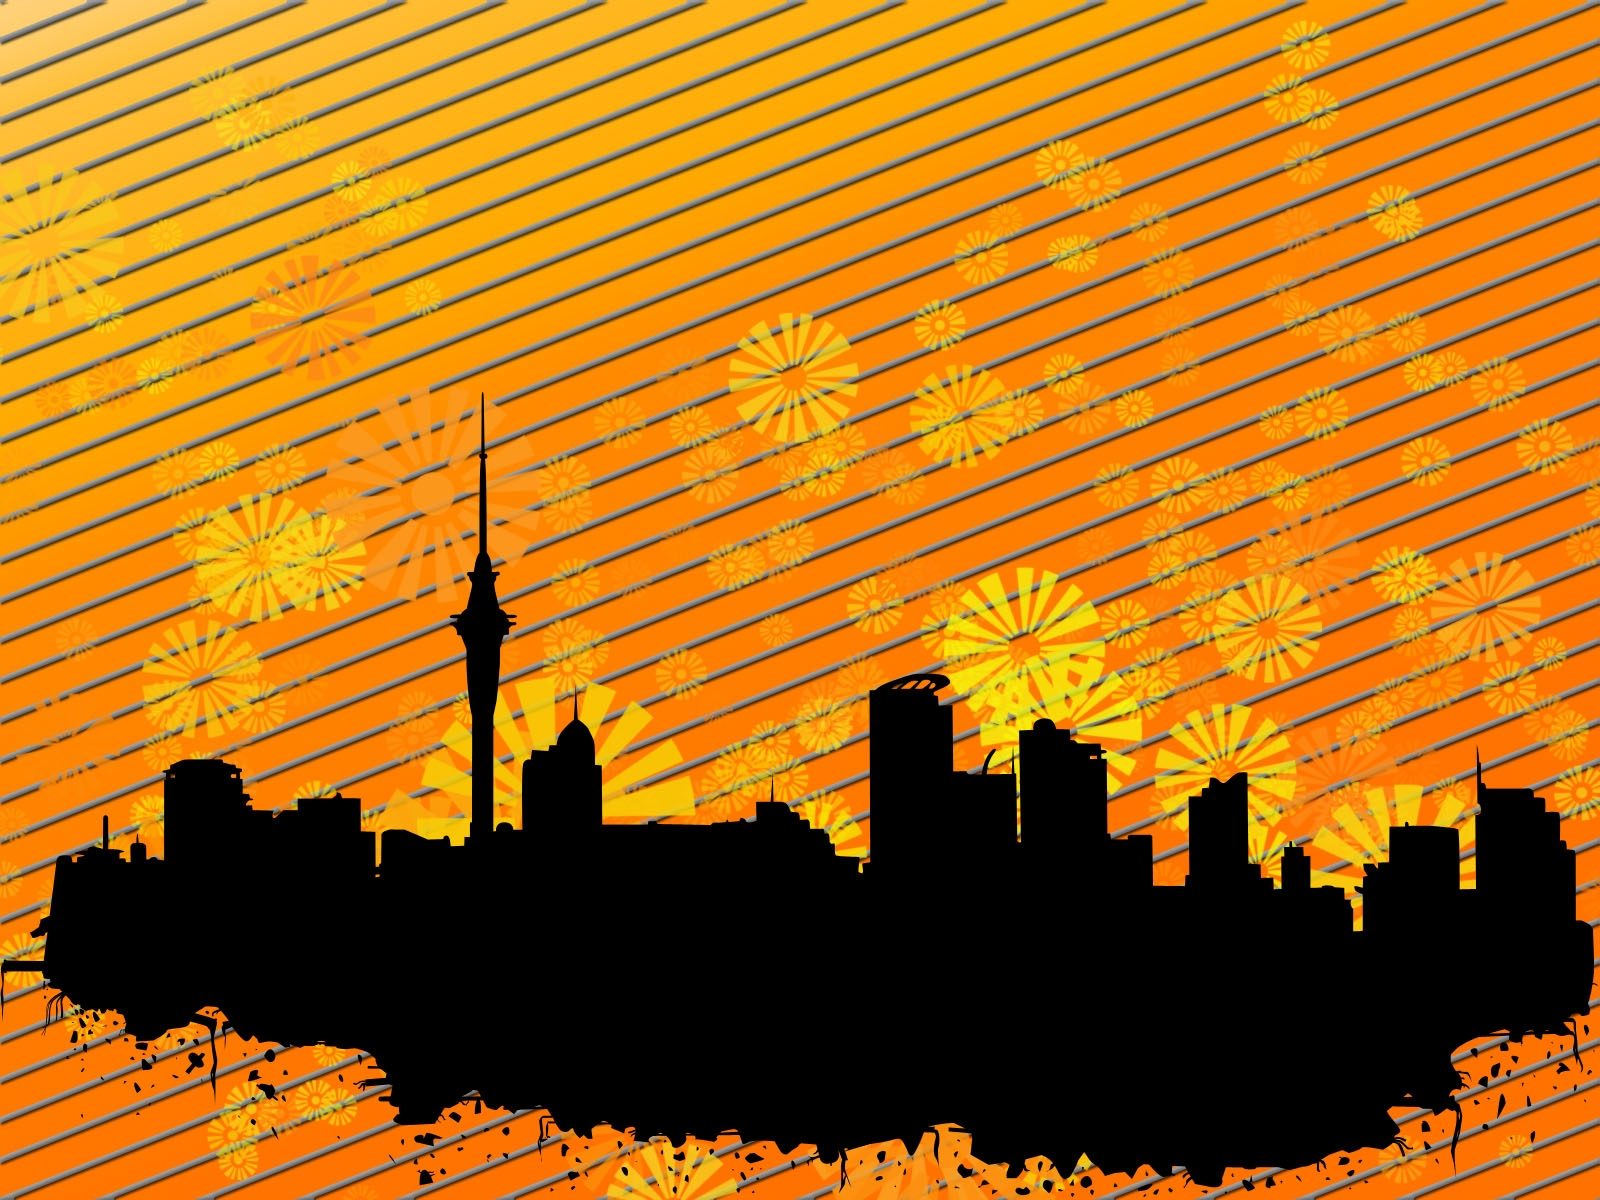 city, buildings, strip Wallpaper, HD Vector 4K Wallpapers ...